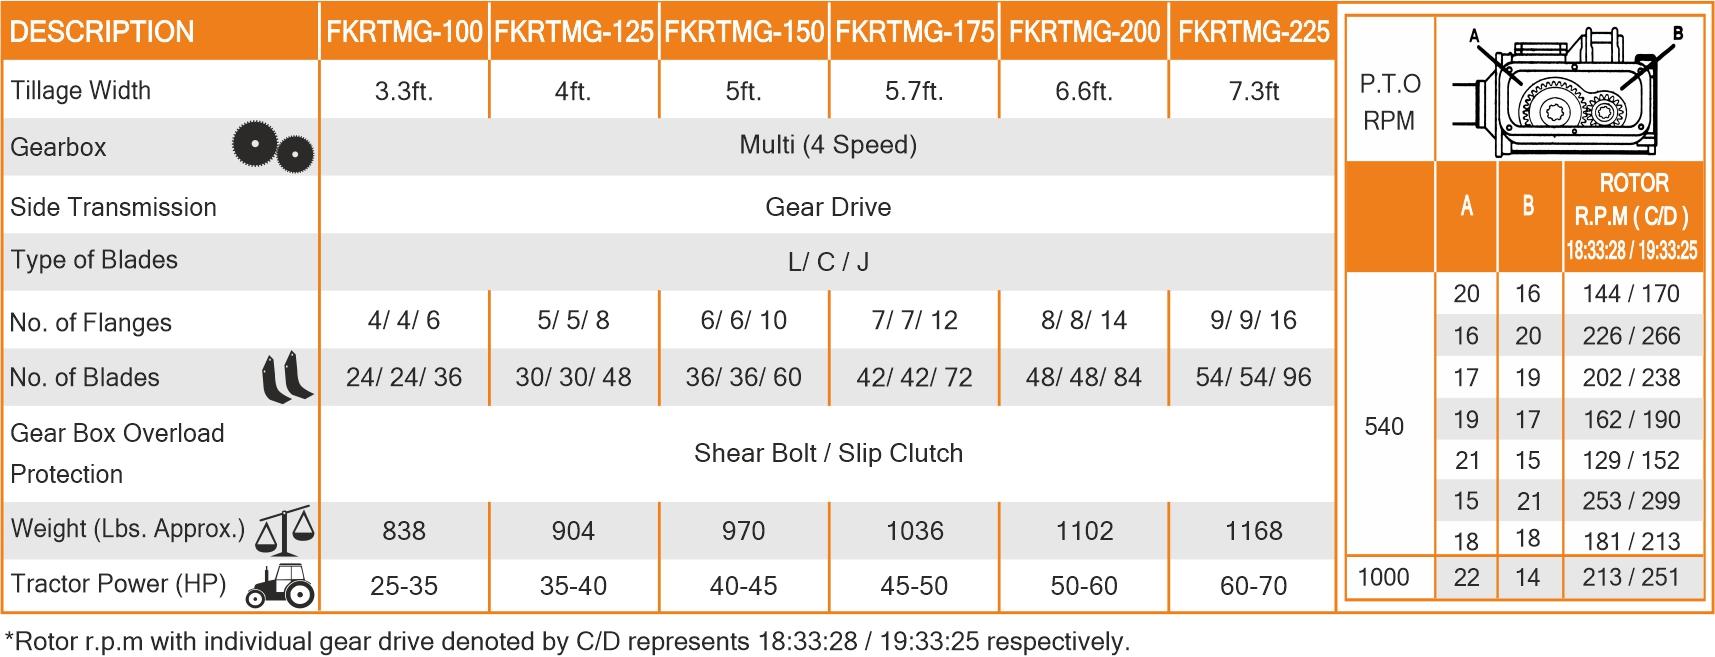 Regular Series-Four Speed Tillers  Spectifications